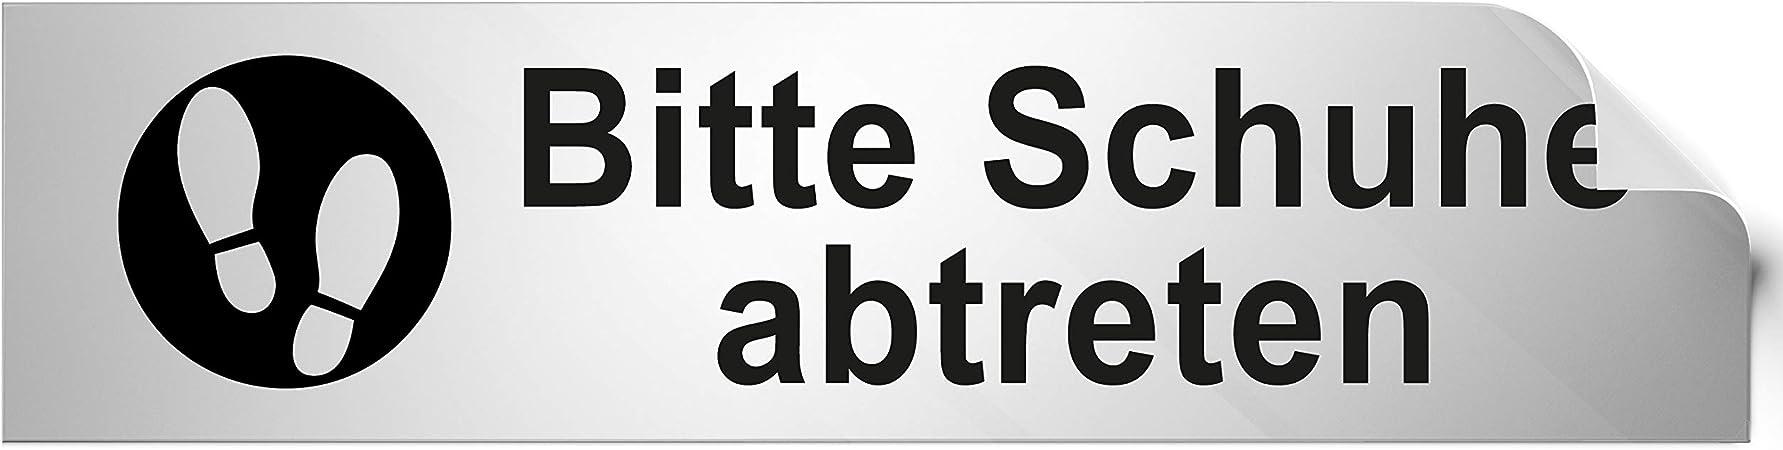 Kinekt3d Leitsysteme T/ürschild PVC Hinweisschild Information 160mm x 40mm Silber//Schwarz selbstklebend